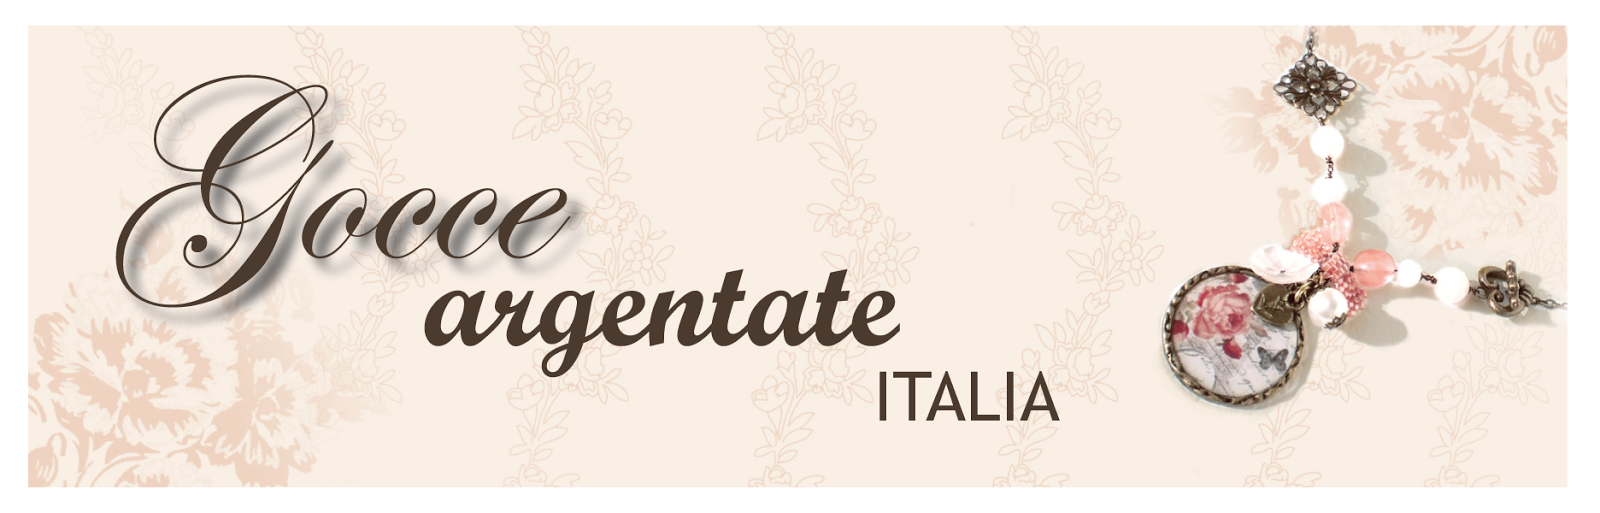 Gocce Argentate Italia